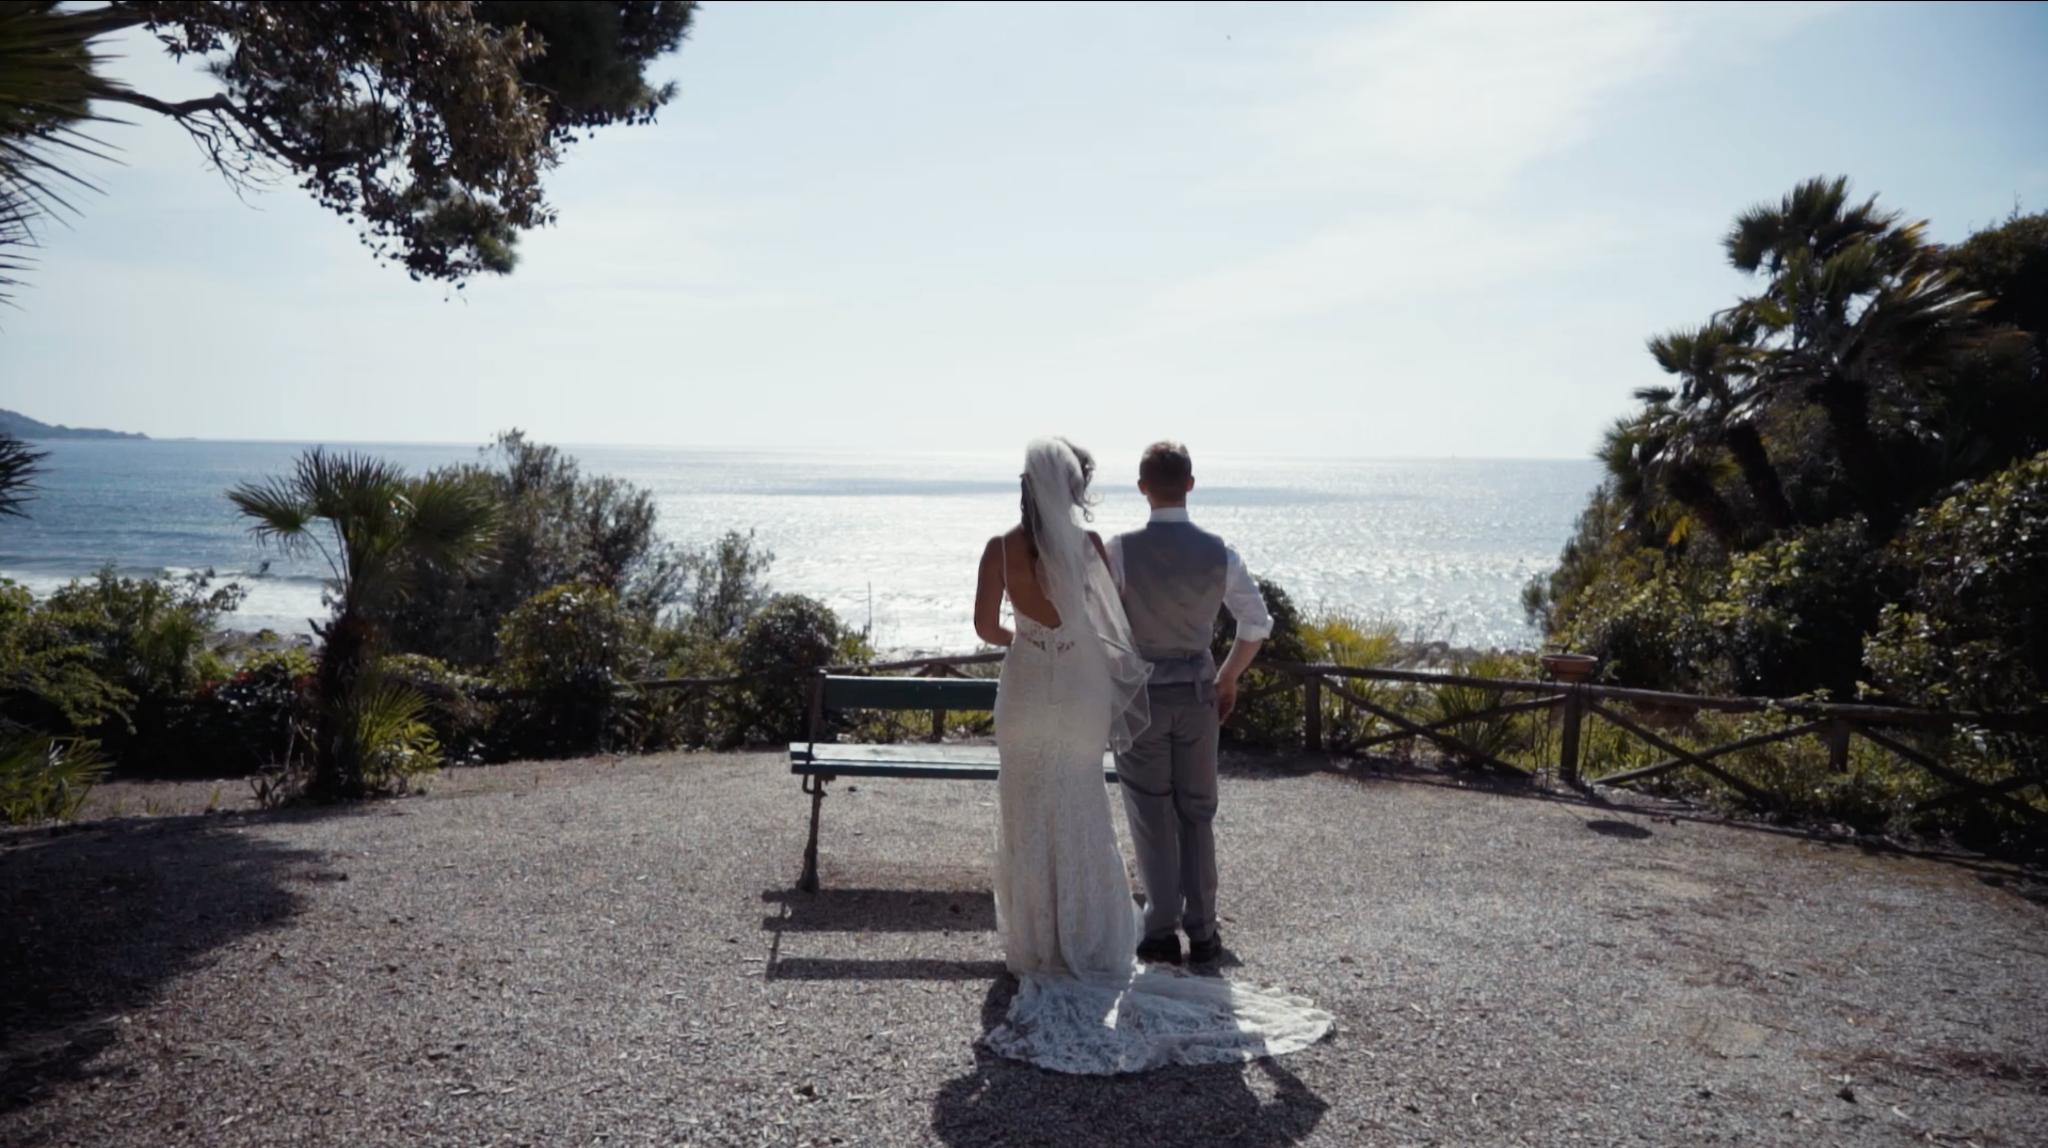 Il matrimonio di George e Melanie a Castellabate, Salerno